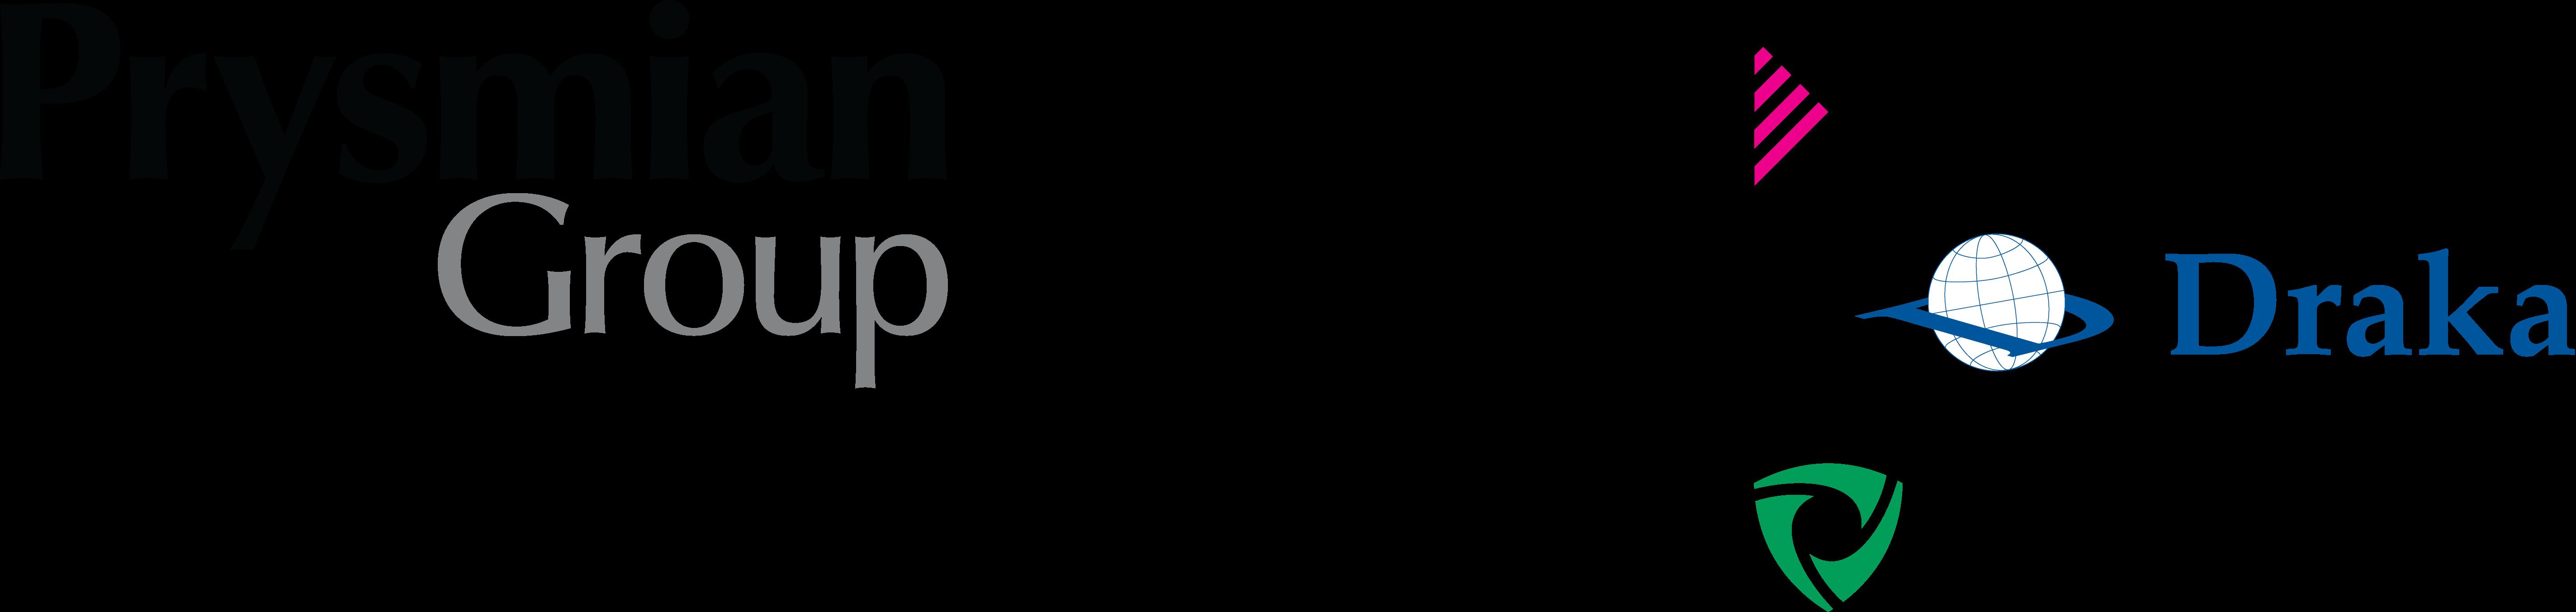 Prysmian Group Draka General Cable Logo